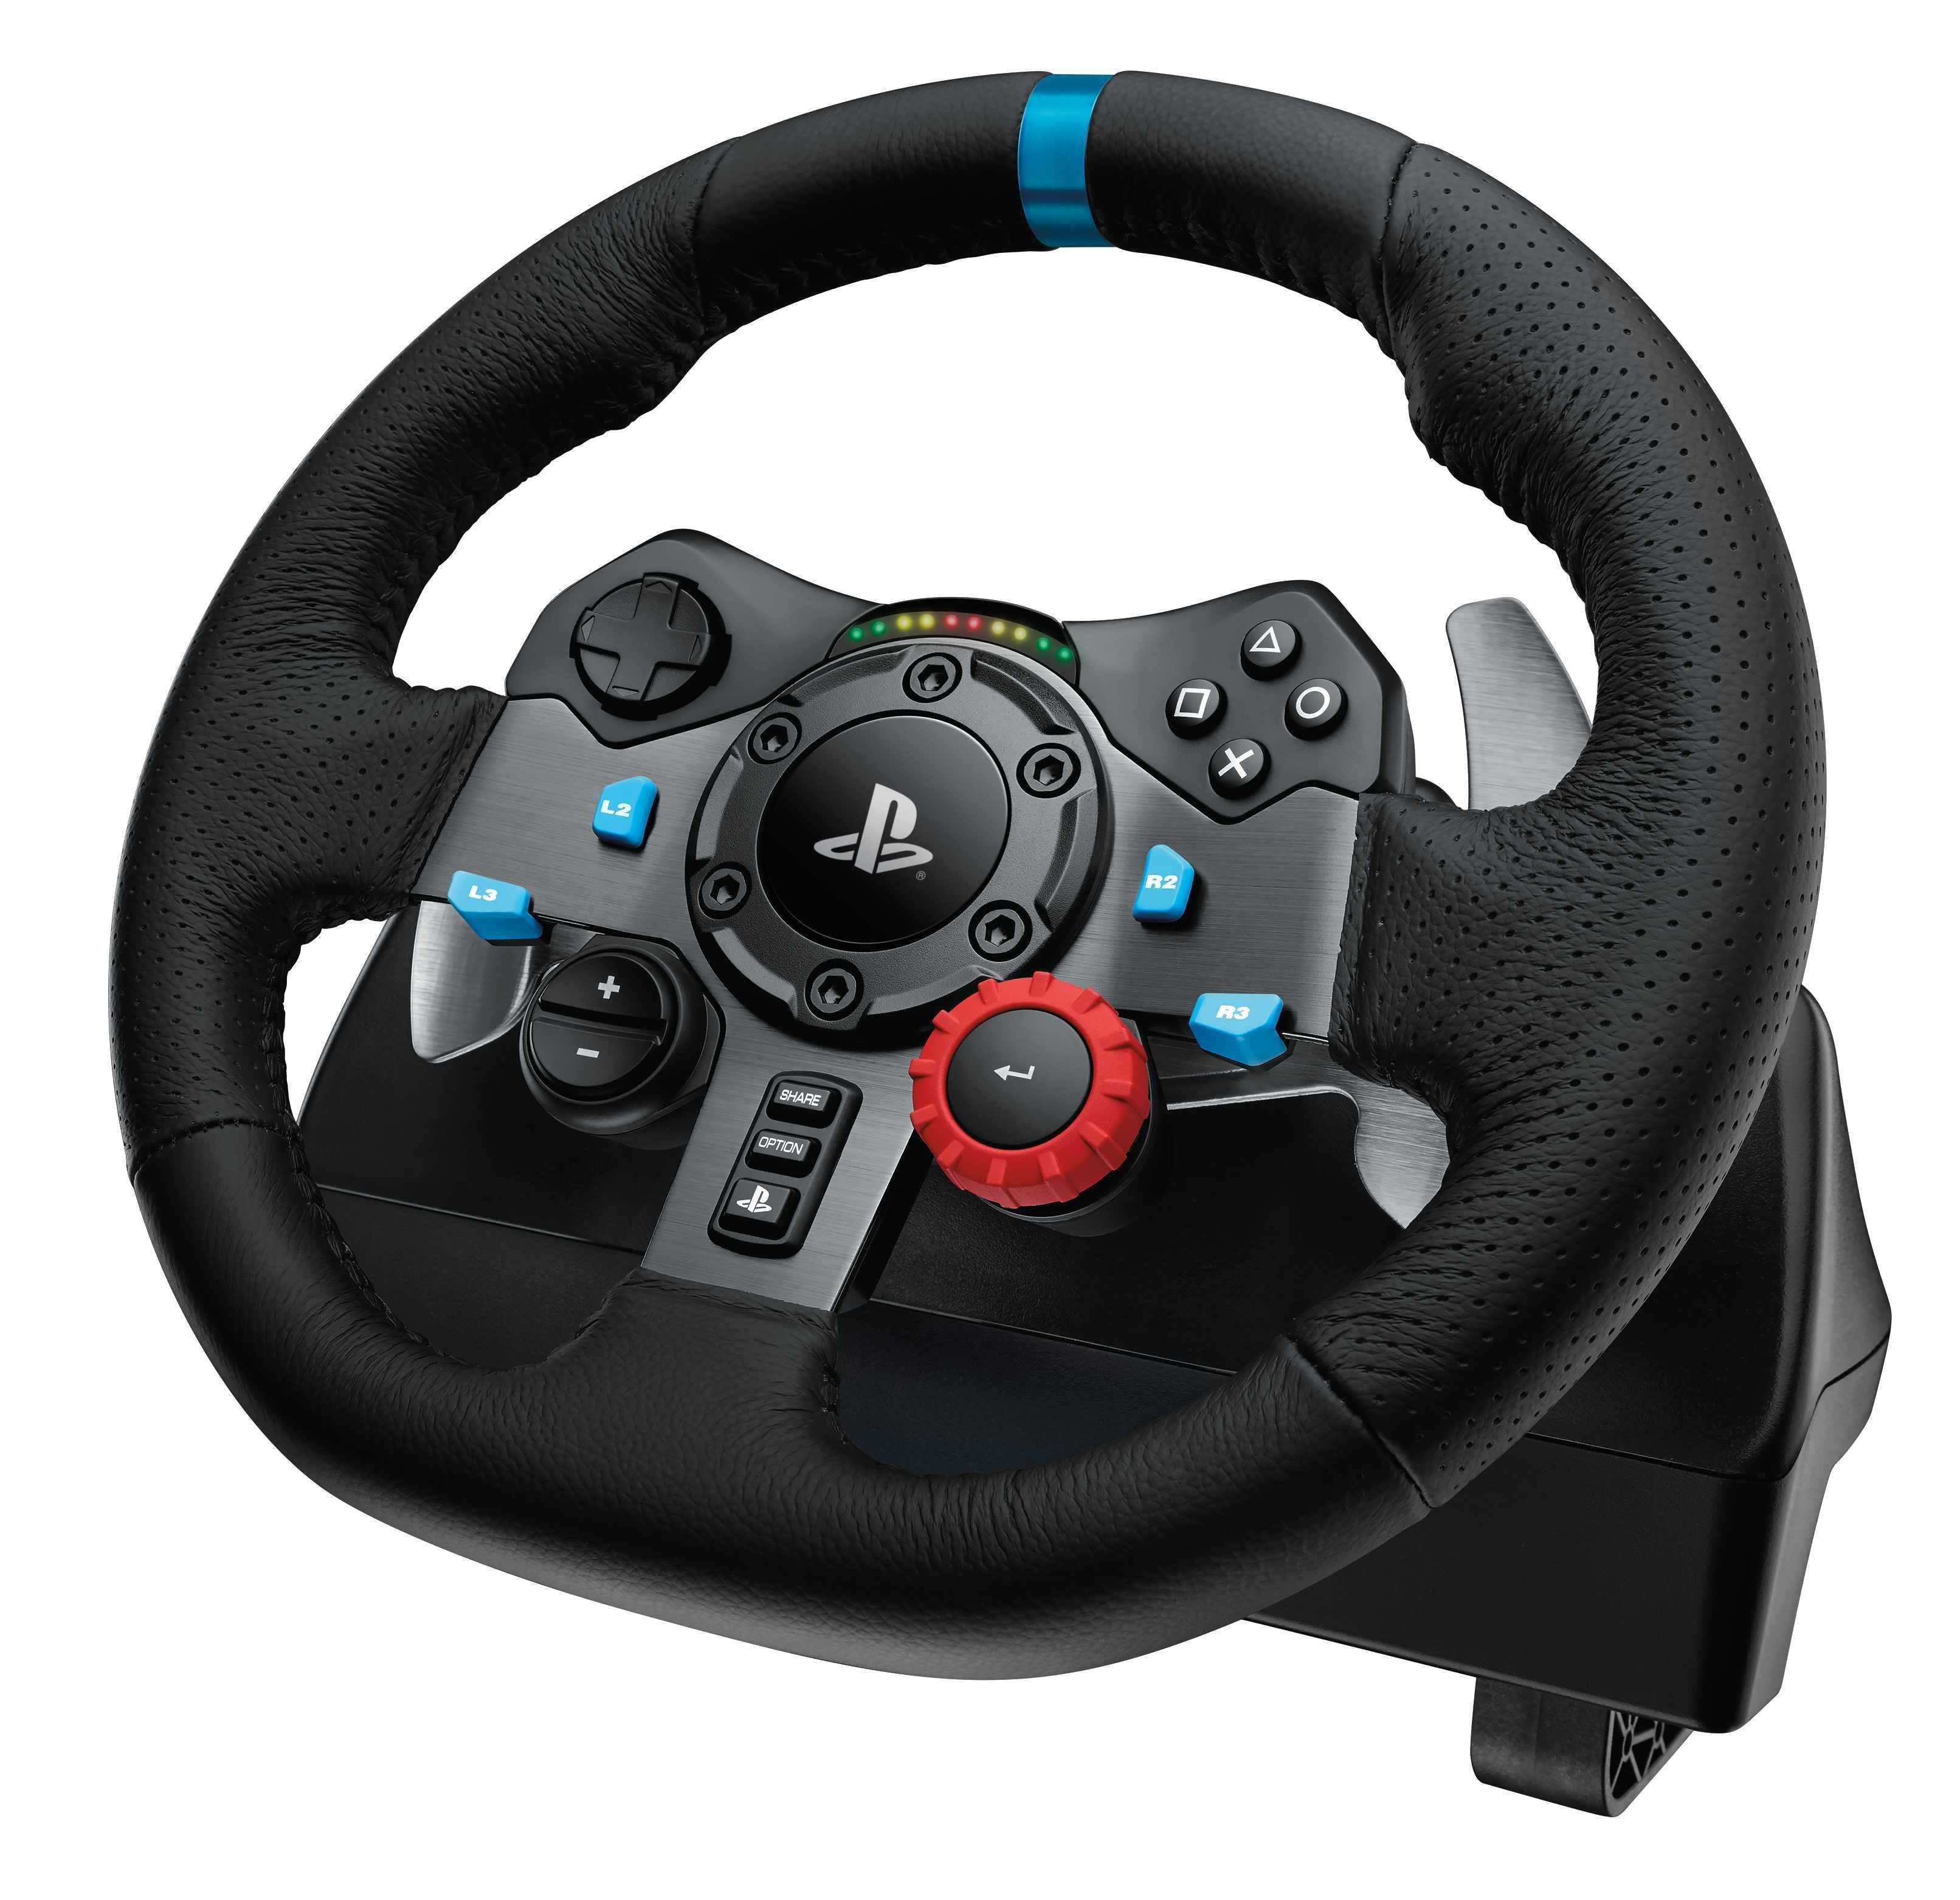 Logitech force feedback racing wheel 600 02